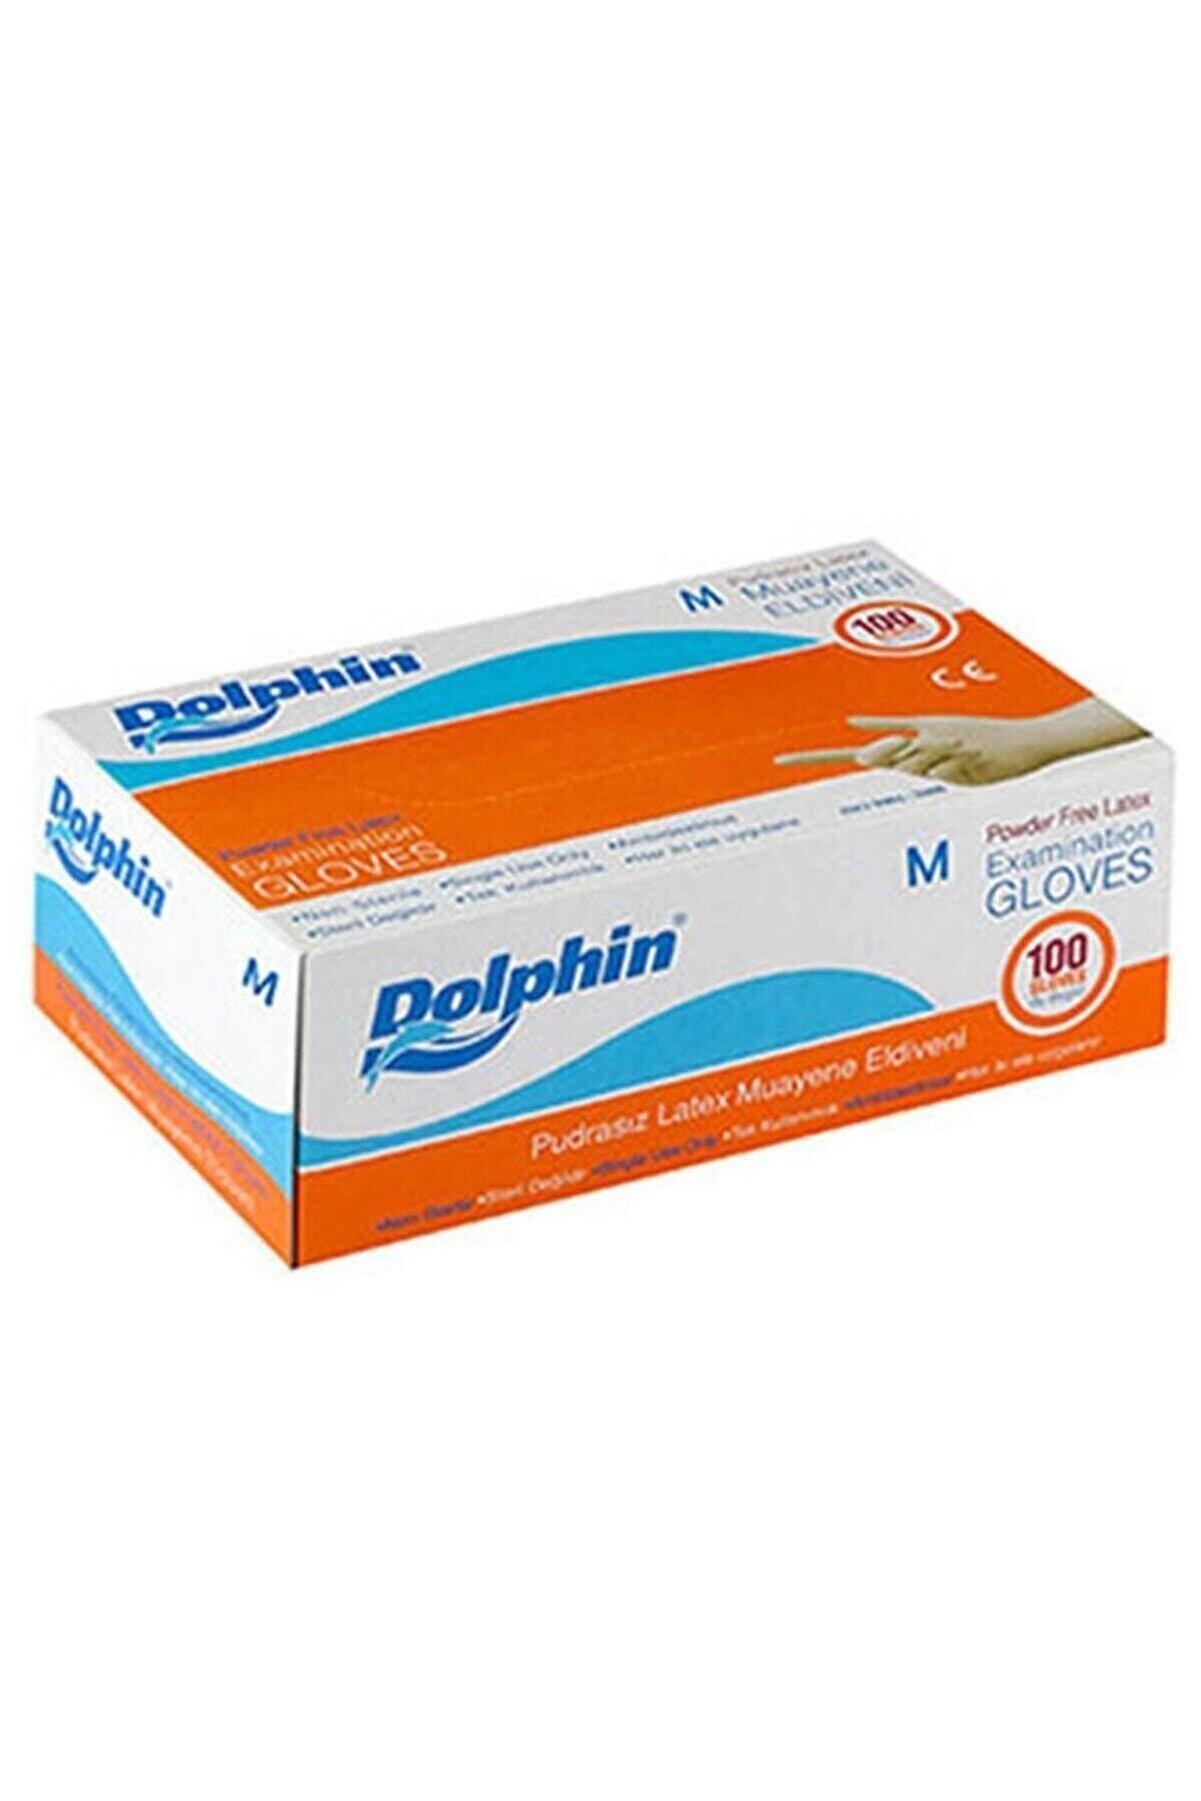 Dolphin Beyaz Lateks Eldiven Pudrasız m 100lü Paket